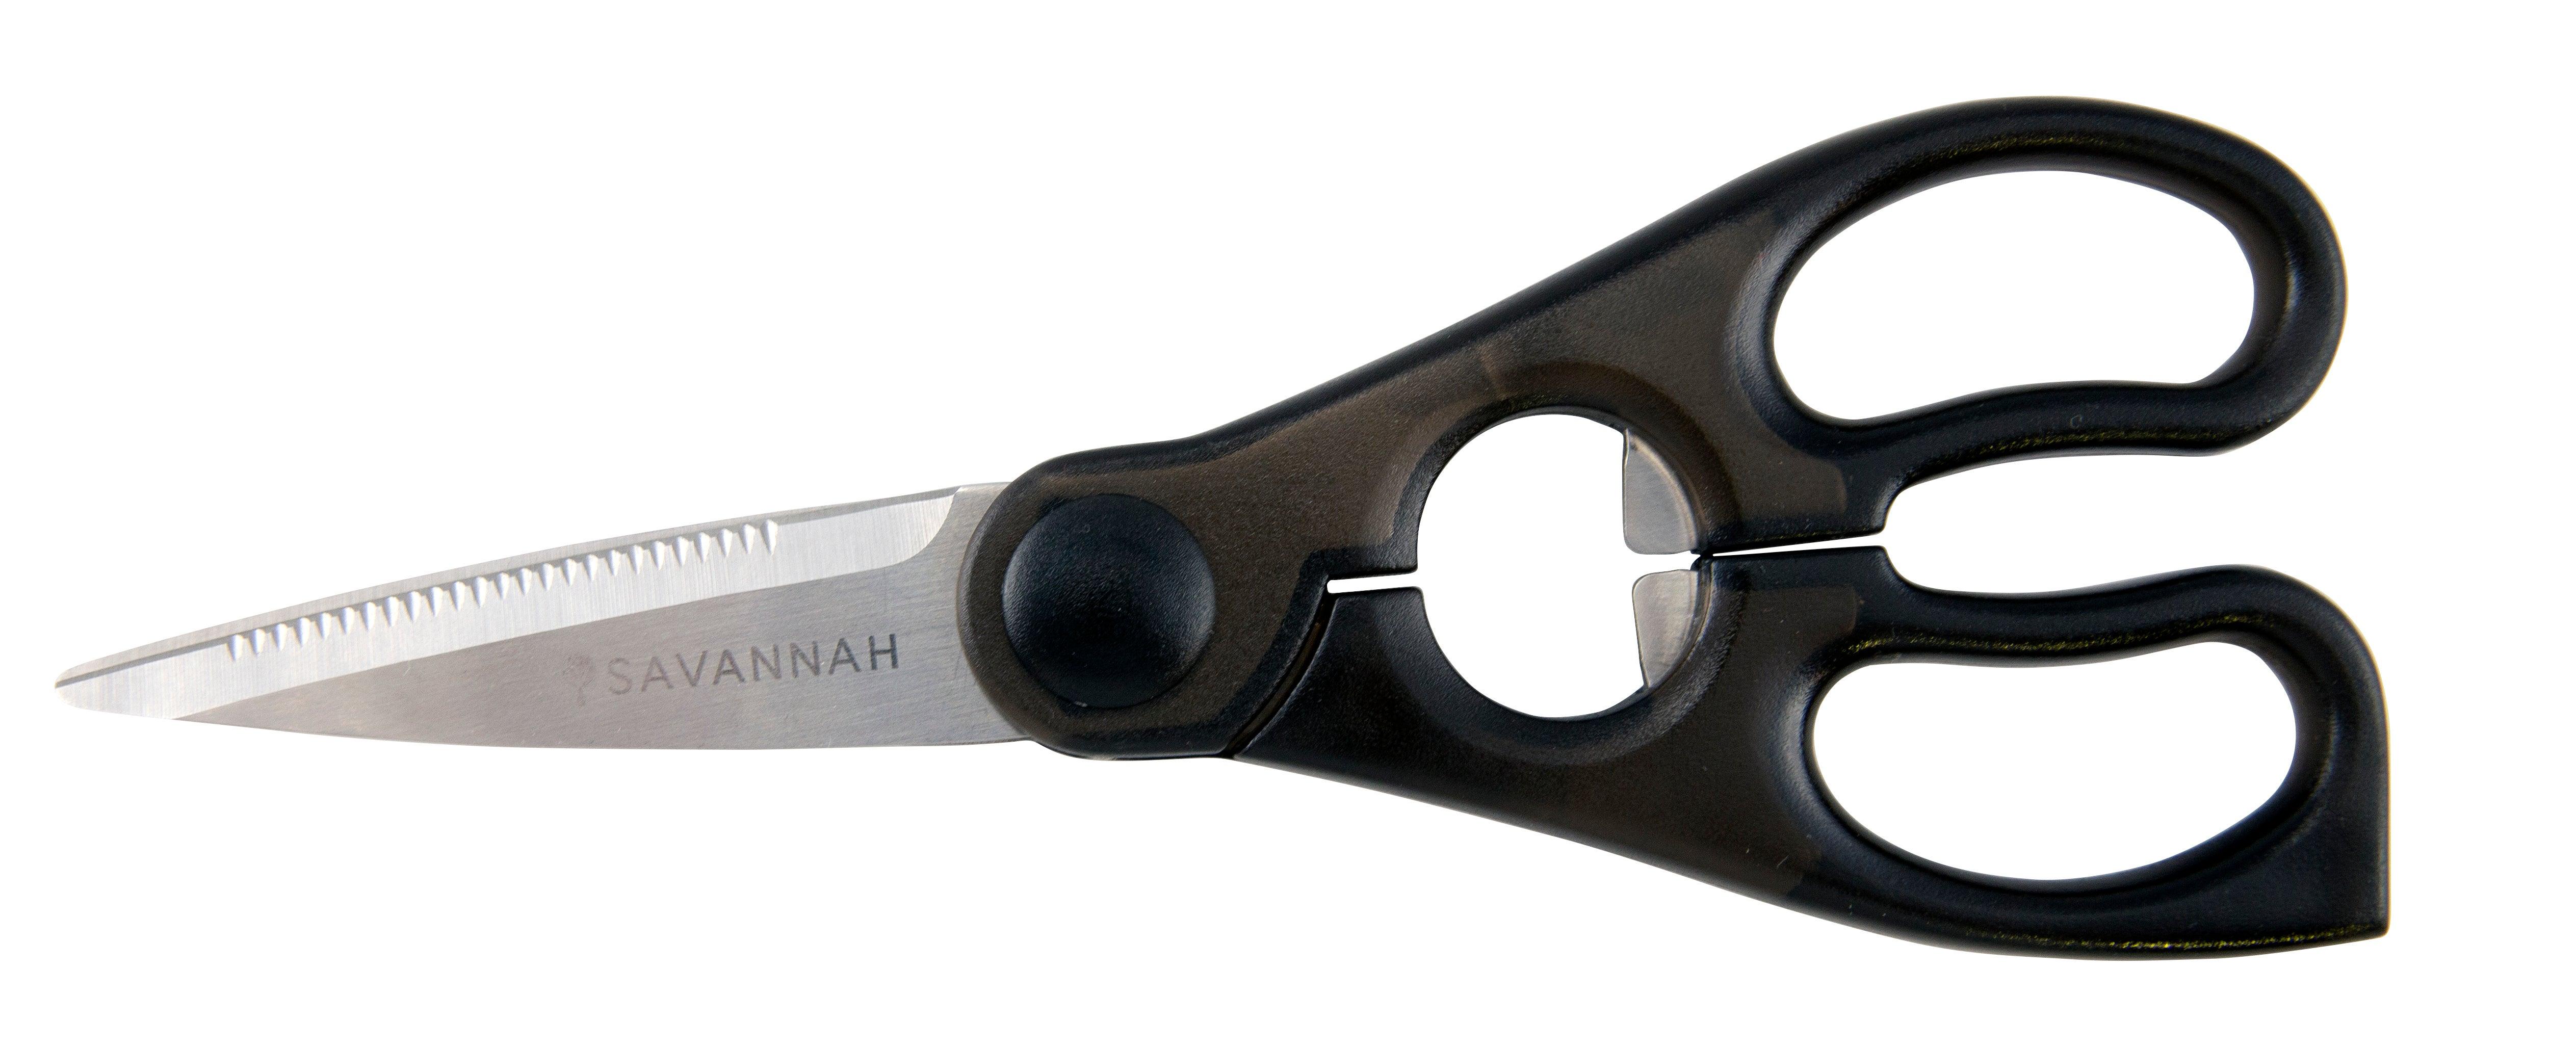 Savannah Stainless Steel Kitchen Scissors Black/Stainless Steel 20x8x1cm